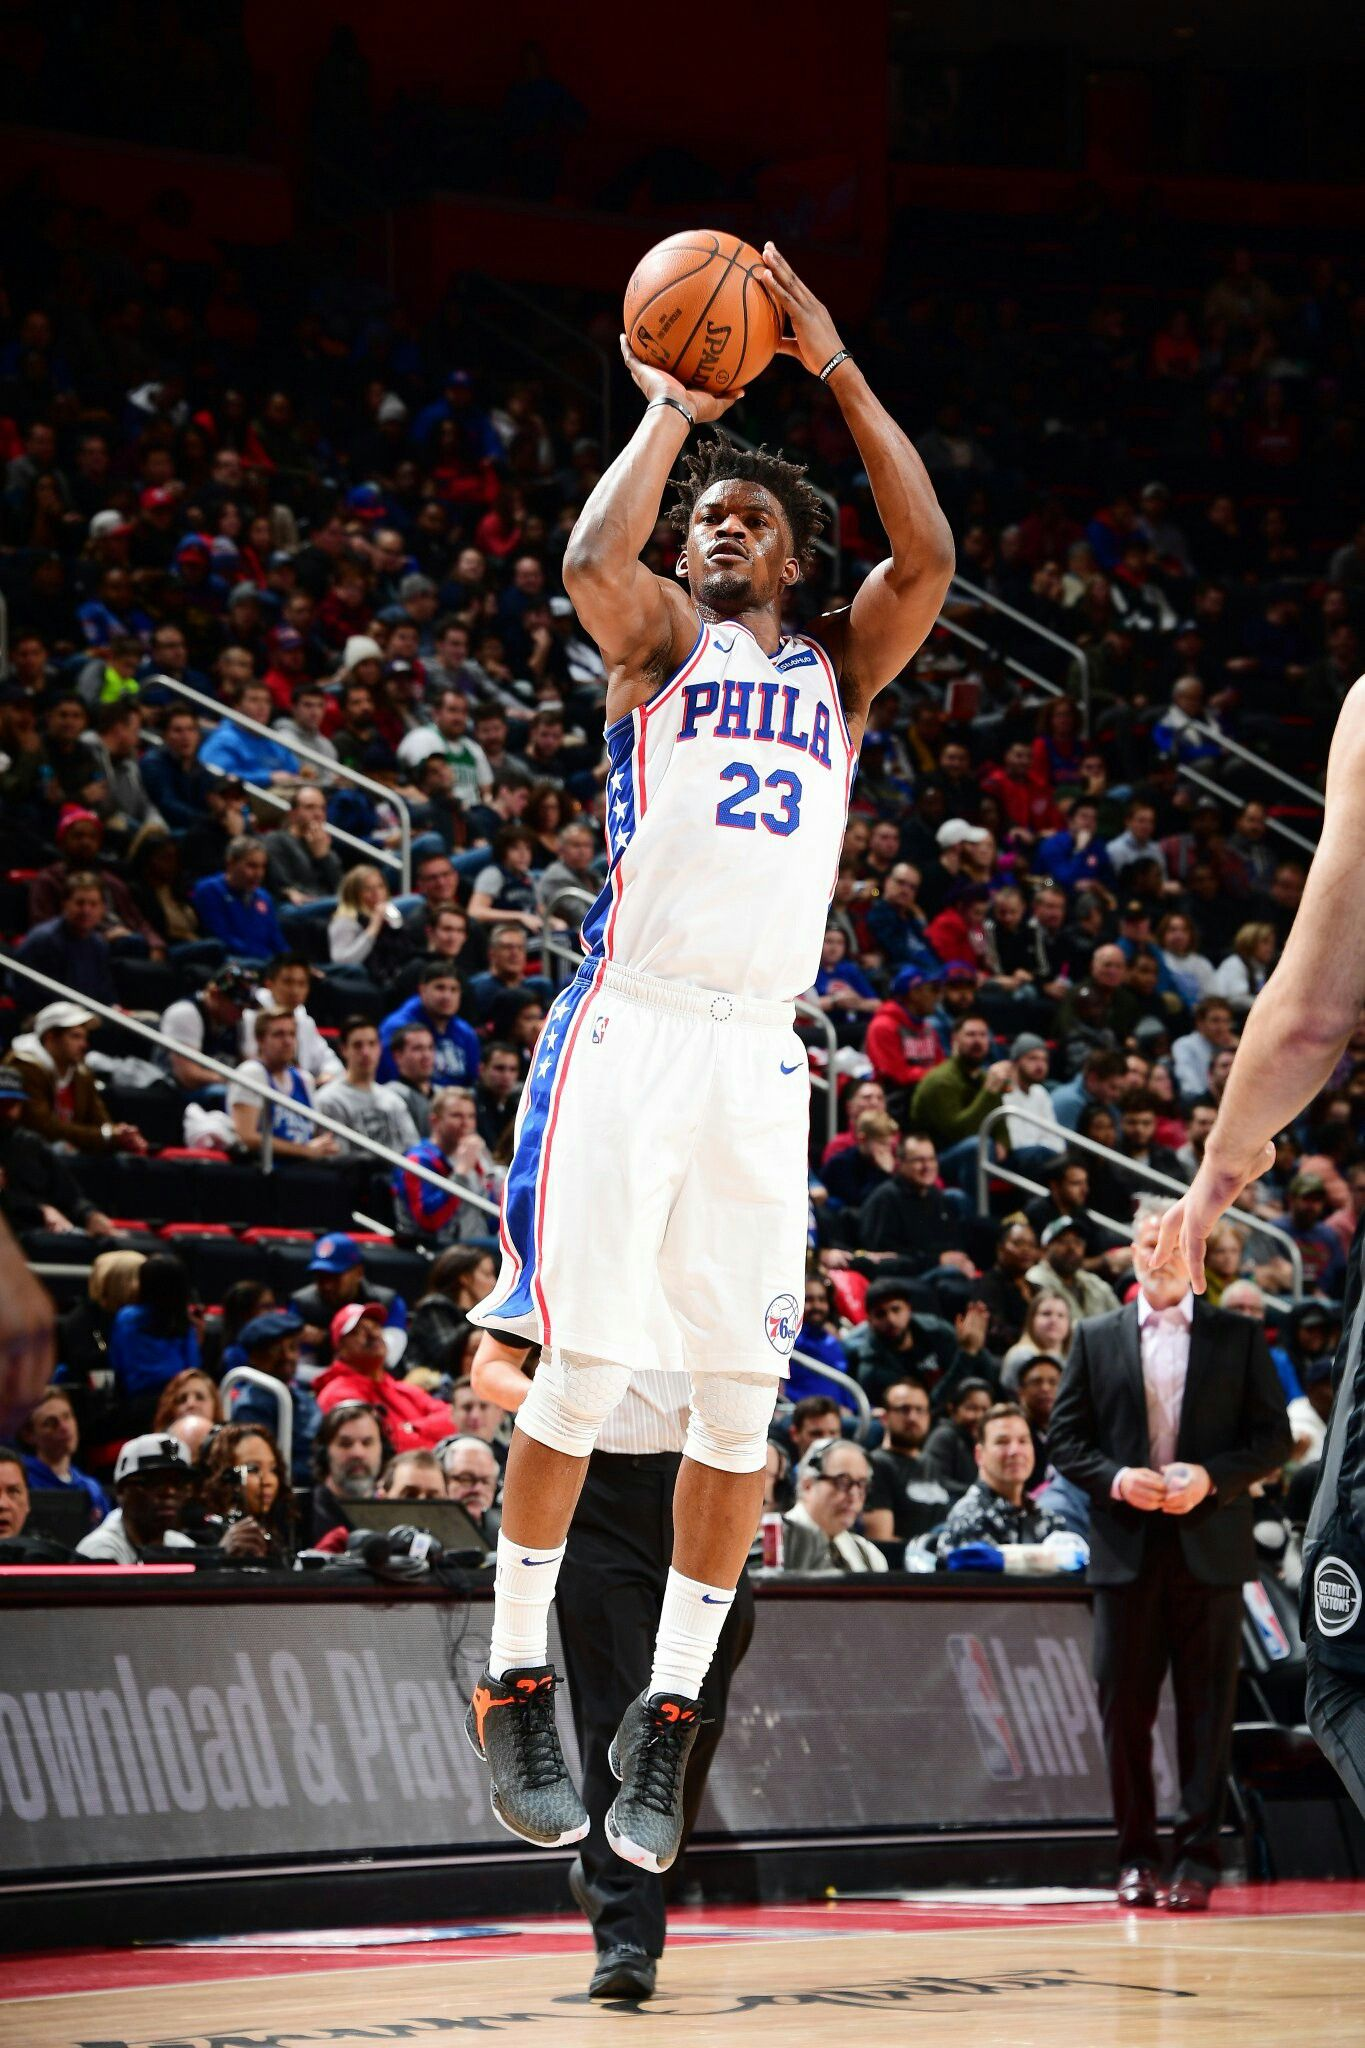 Idea by Shawn Gordon on NBA PHI Nba stars, Basketball